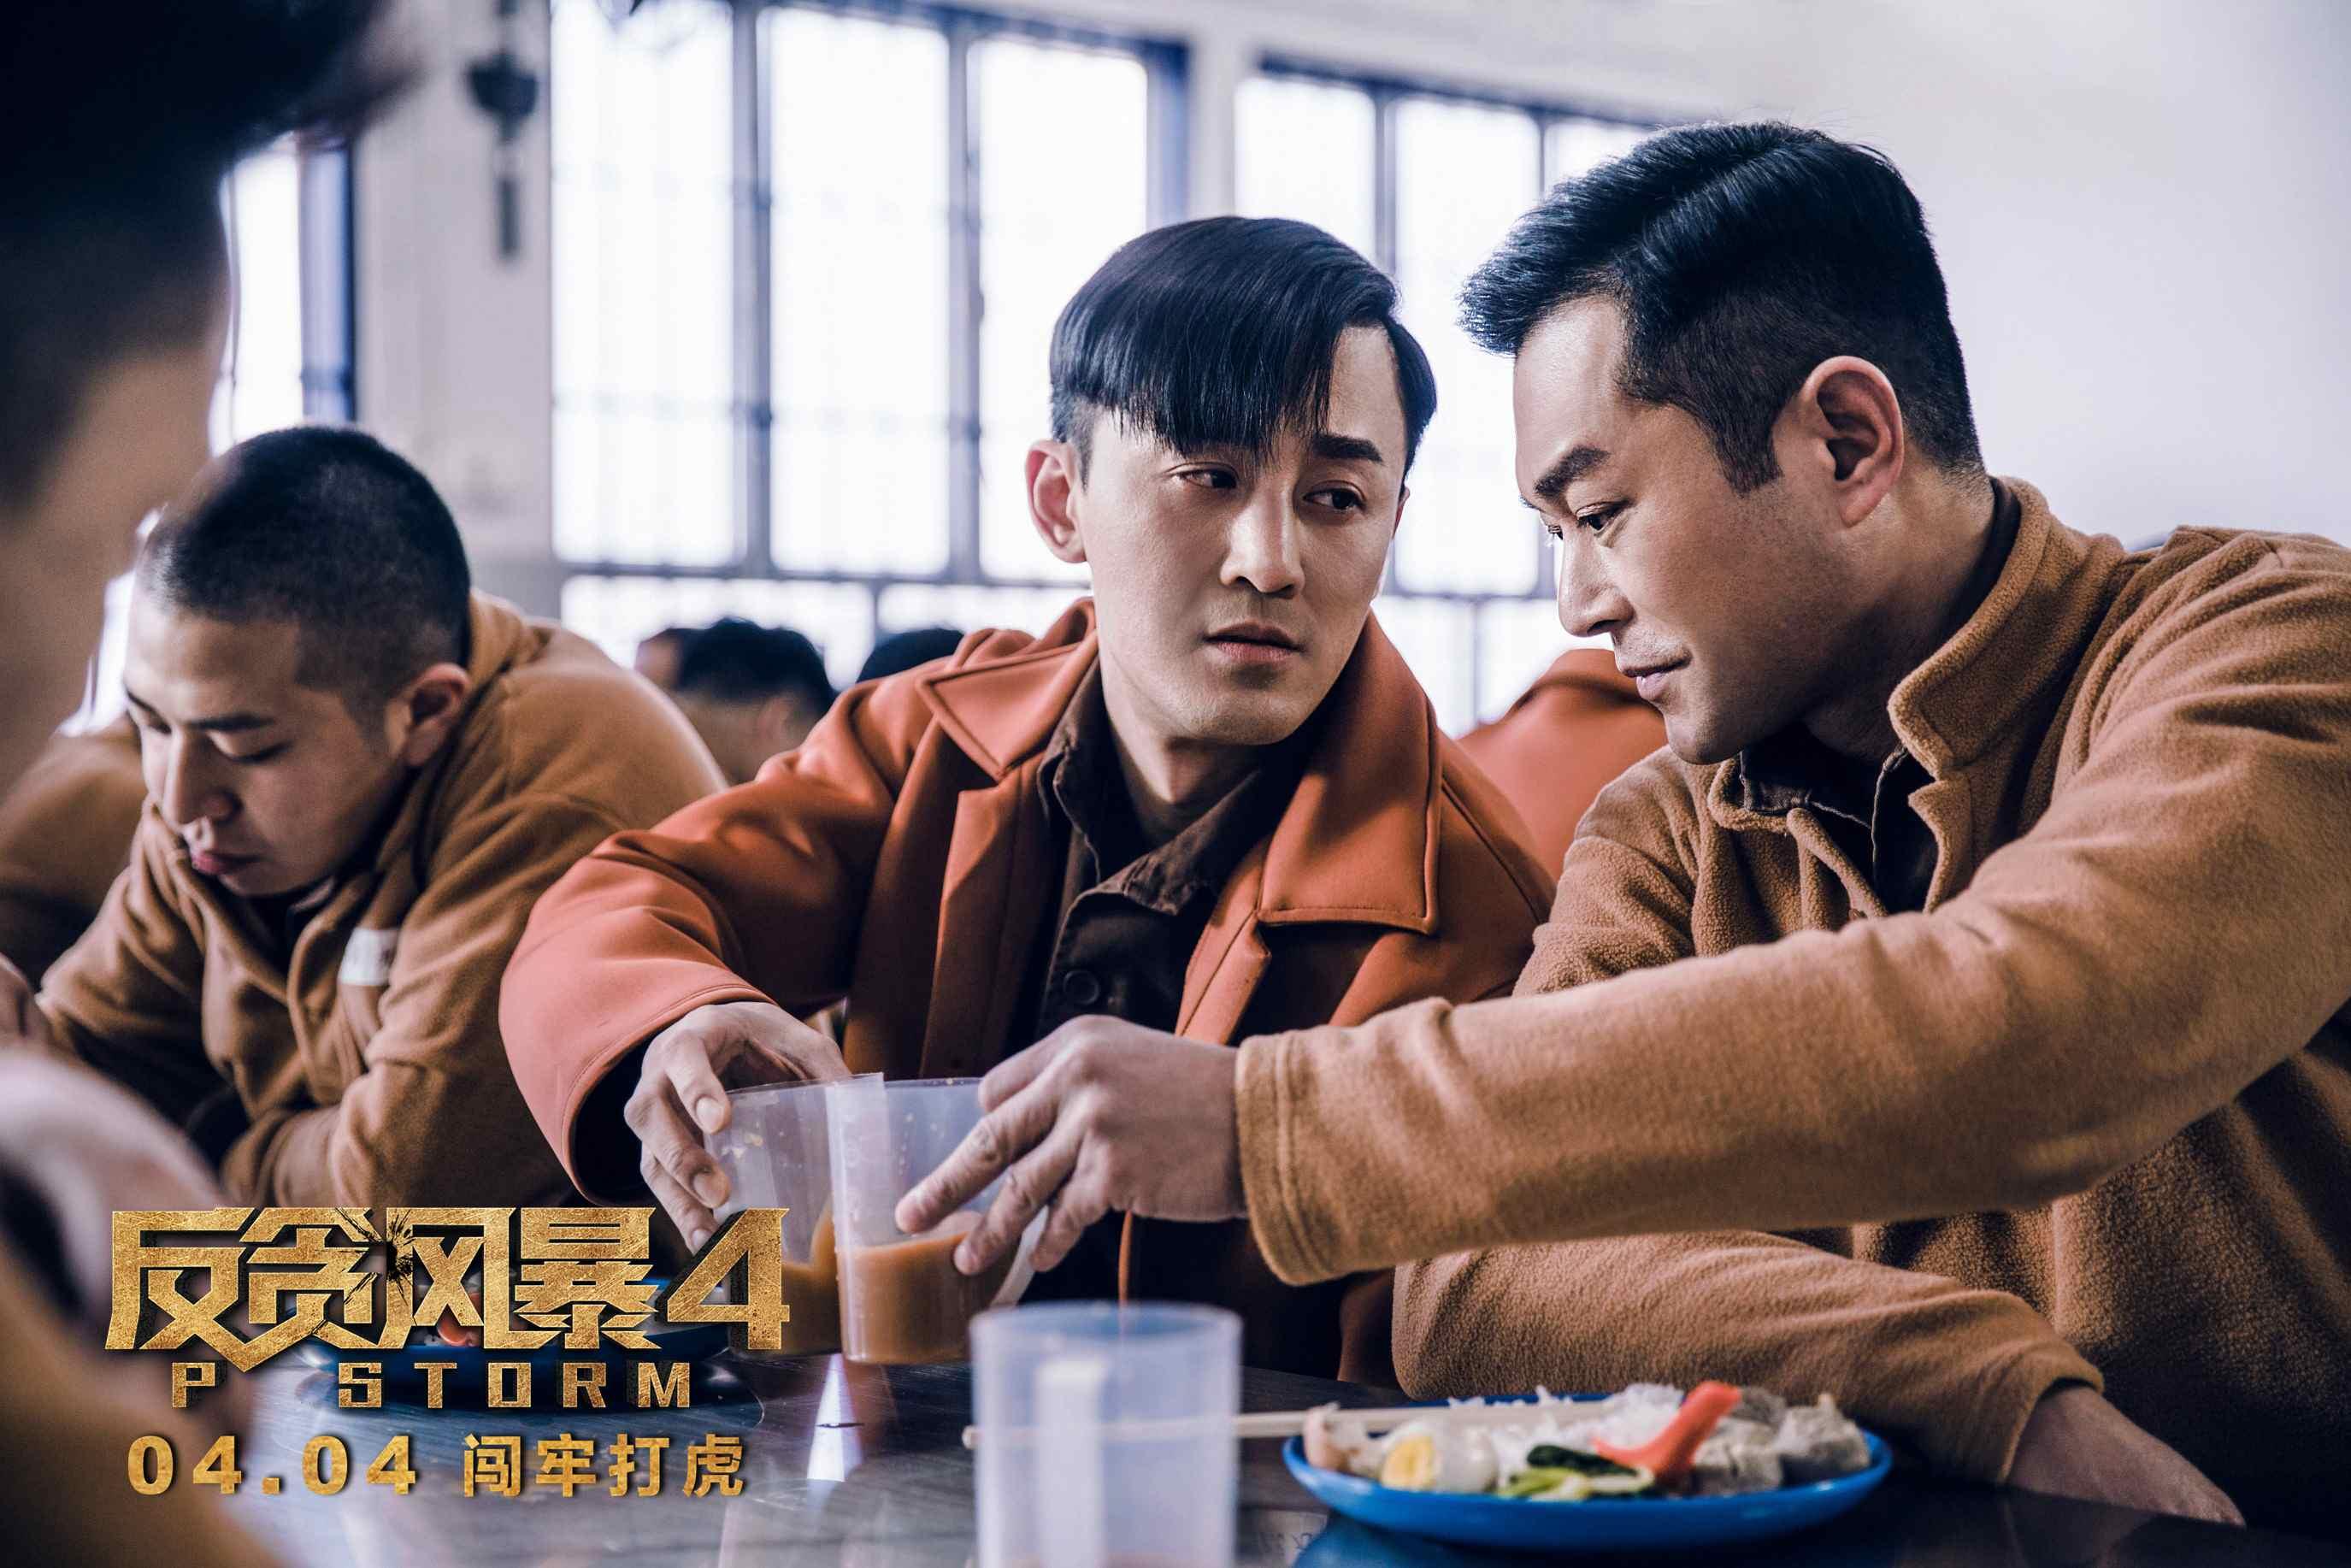 'P Storm' tops daily China box office